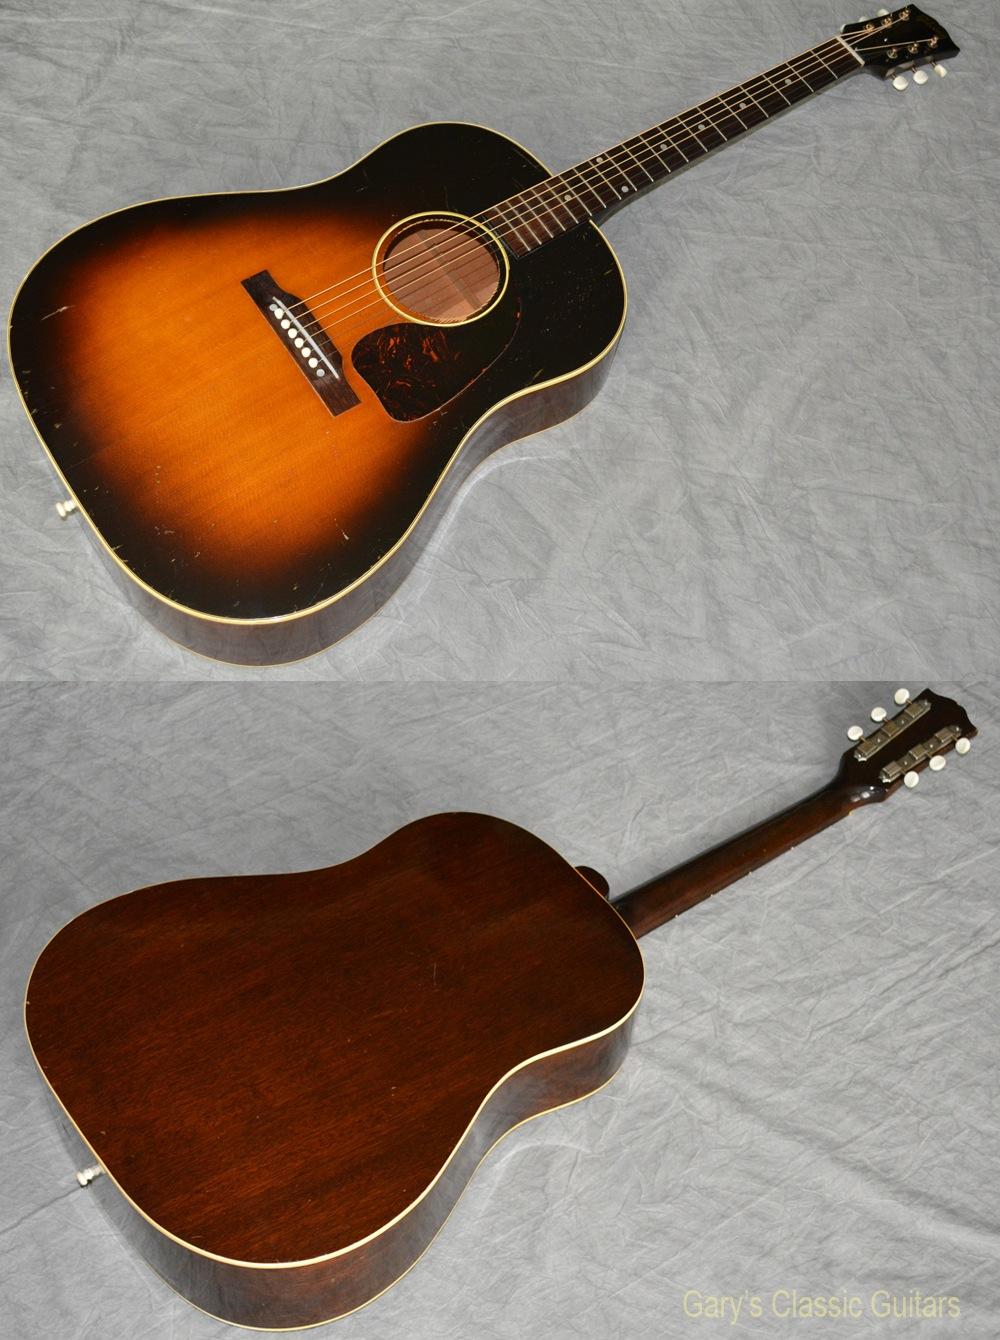 1950 gibson j 45 gia0455 garys classic guitars vintage guitars llc. Black Bedroom Furniture Sets. Home Design Ideas